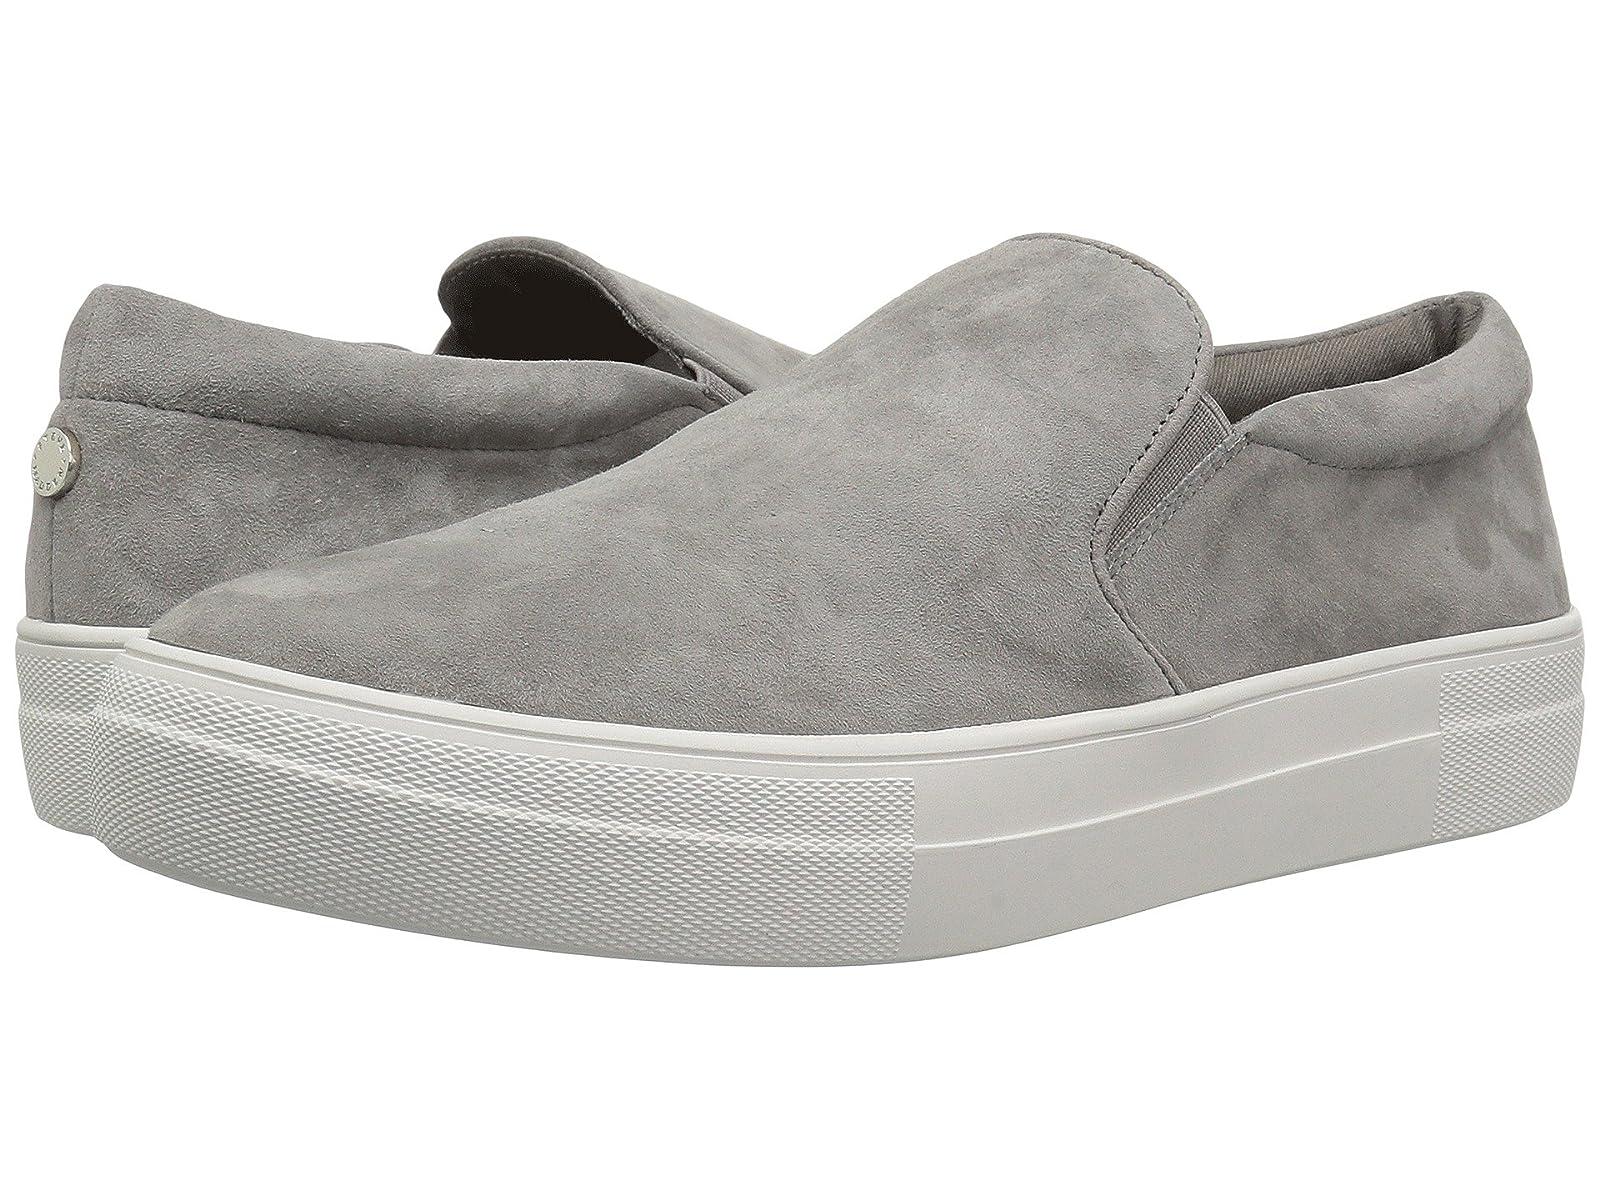 Steve Madden Gills SneakerAtmospheric grades have affordable shoes